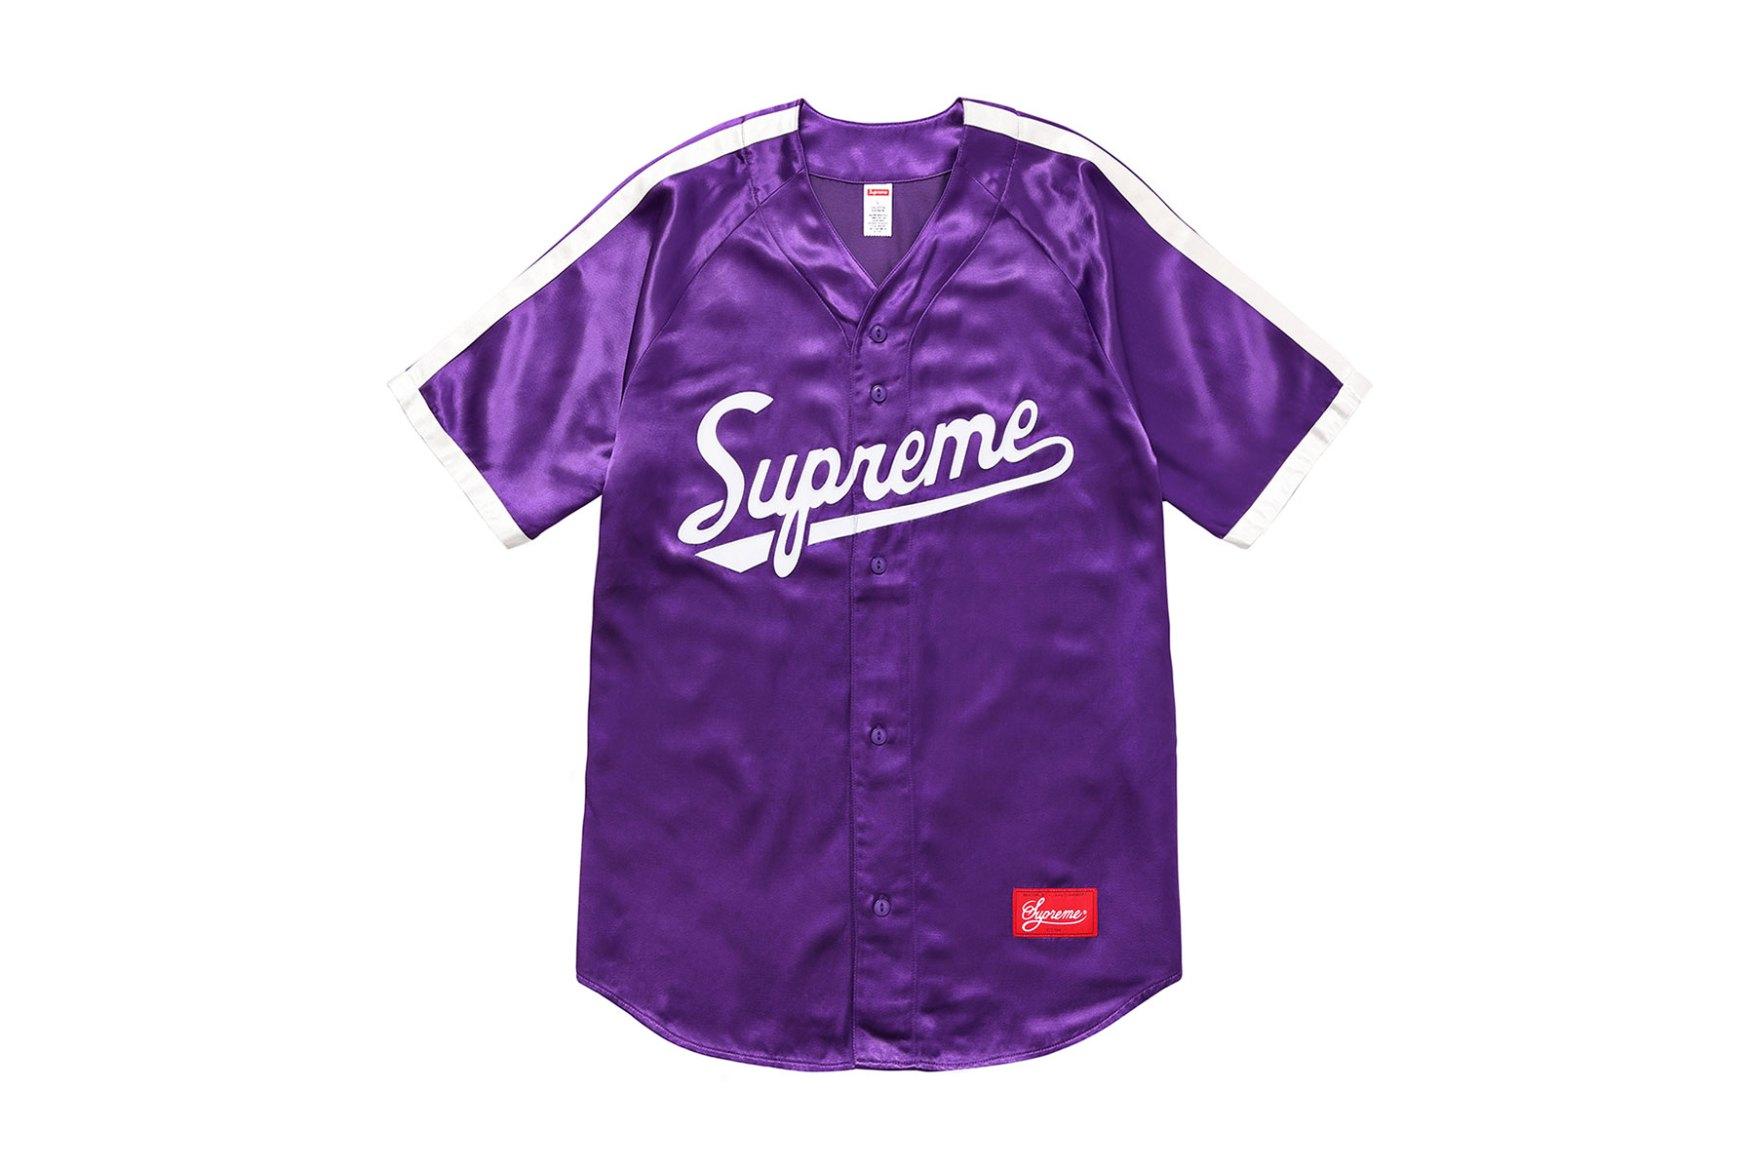 supreme 2017 baseball jersey.jpg